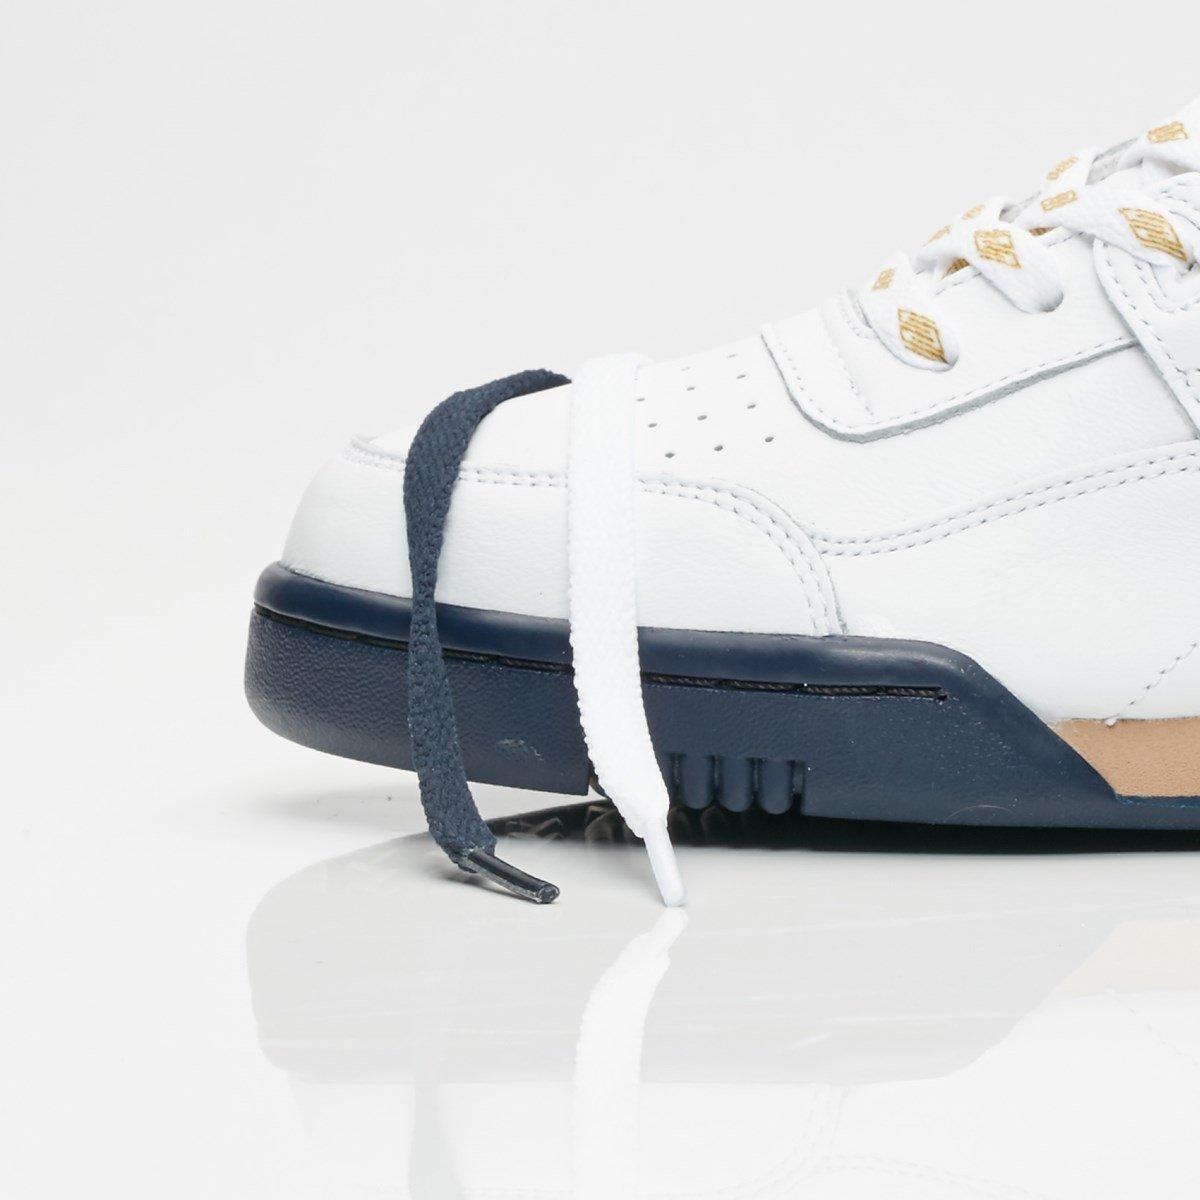 4de9626c2e3e8 Reebok Workout Plus Beams - Cn2176 - Sneakersnstuff